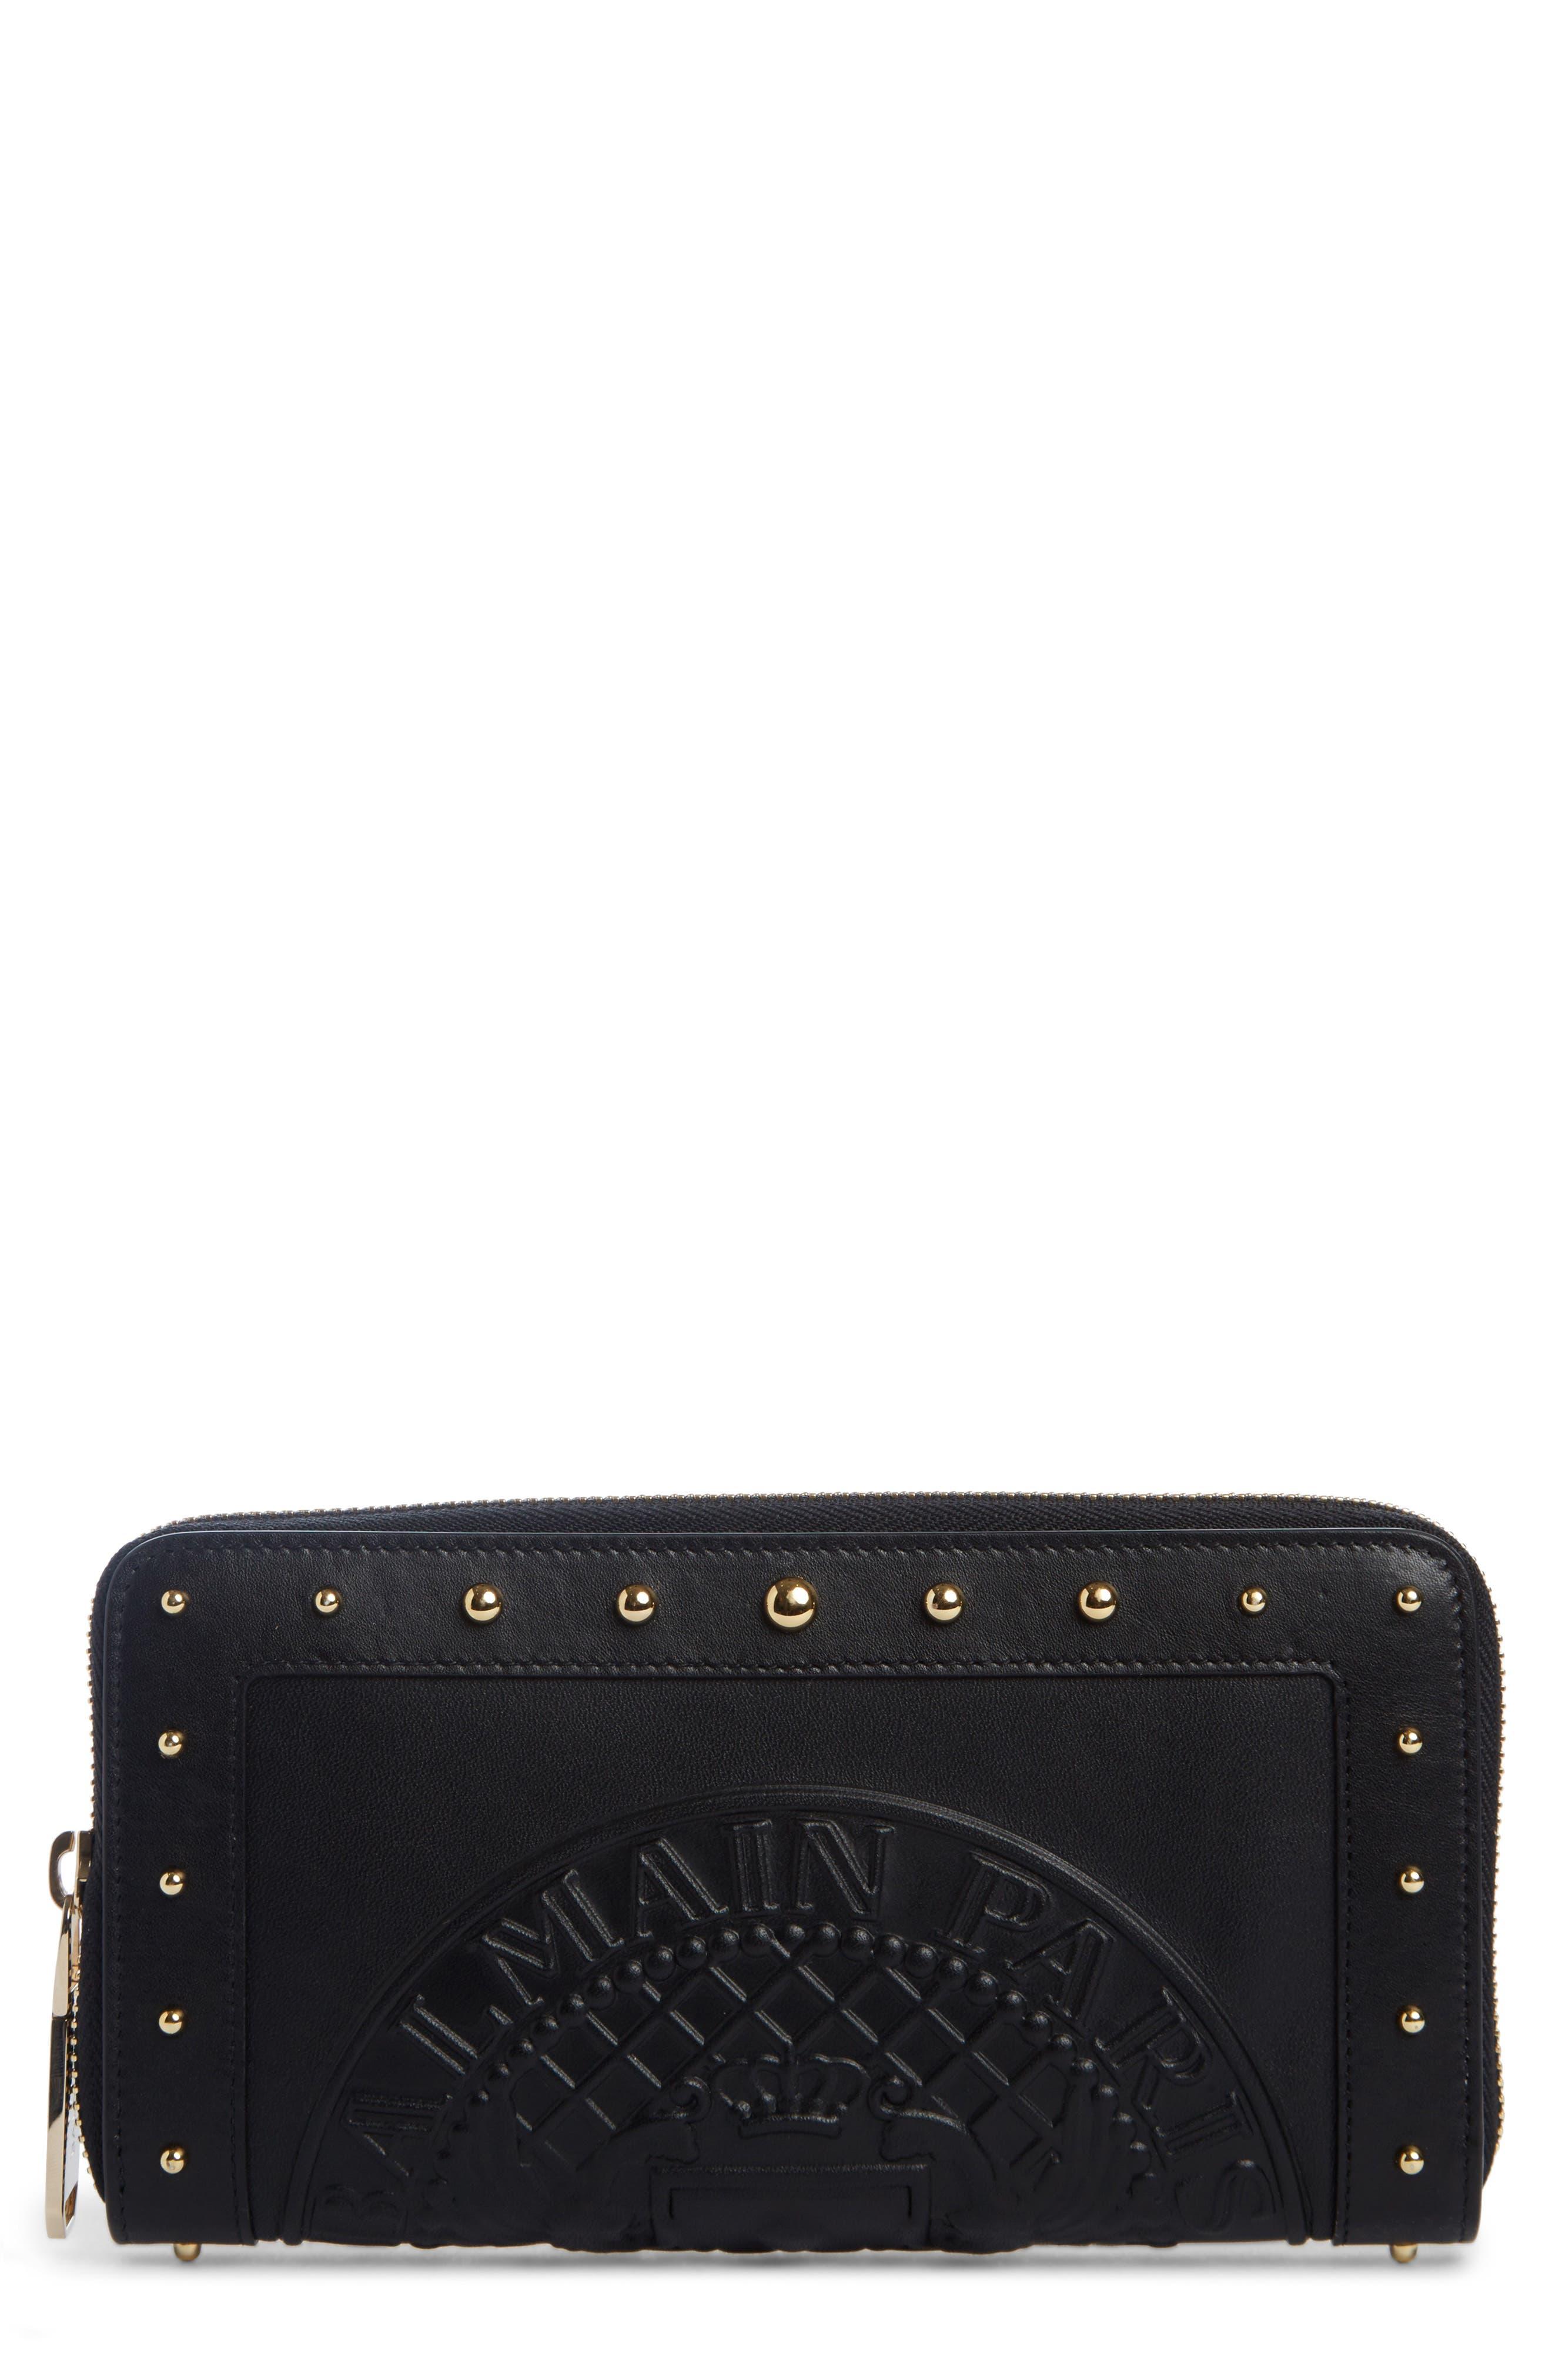 Main Image - Balmain Renaissance Leather Continental Wallet